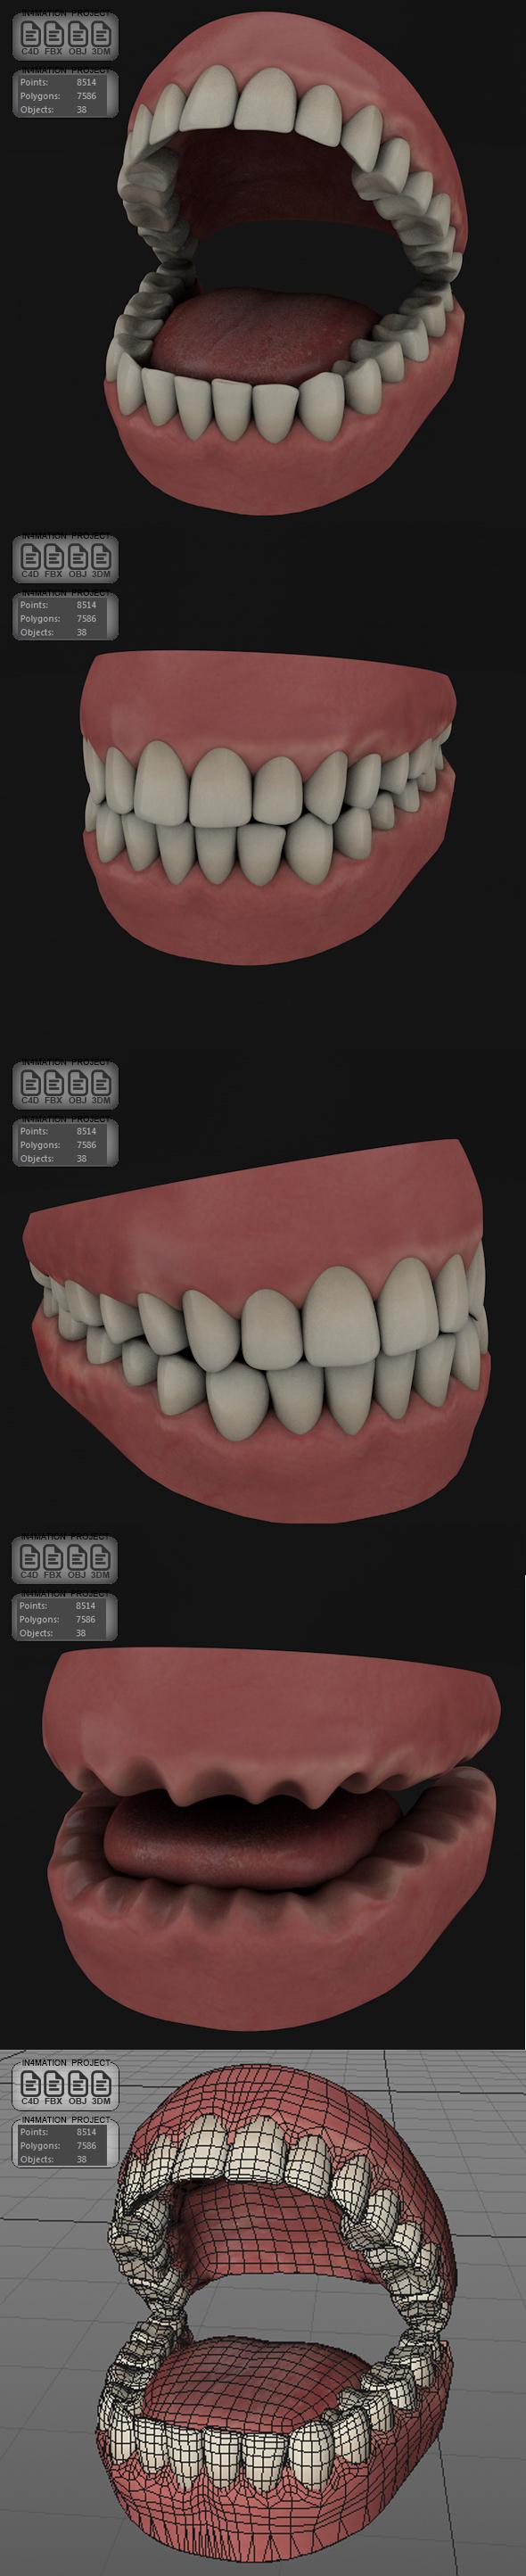 Teeth & Gums - Full Design - 3DOcean Item for Sale